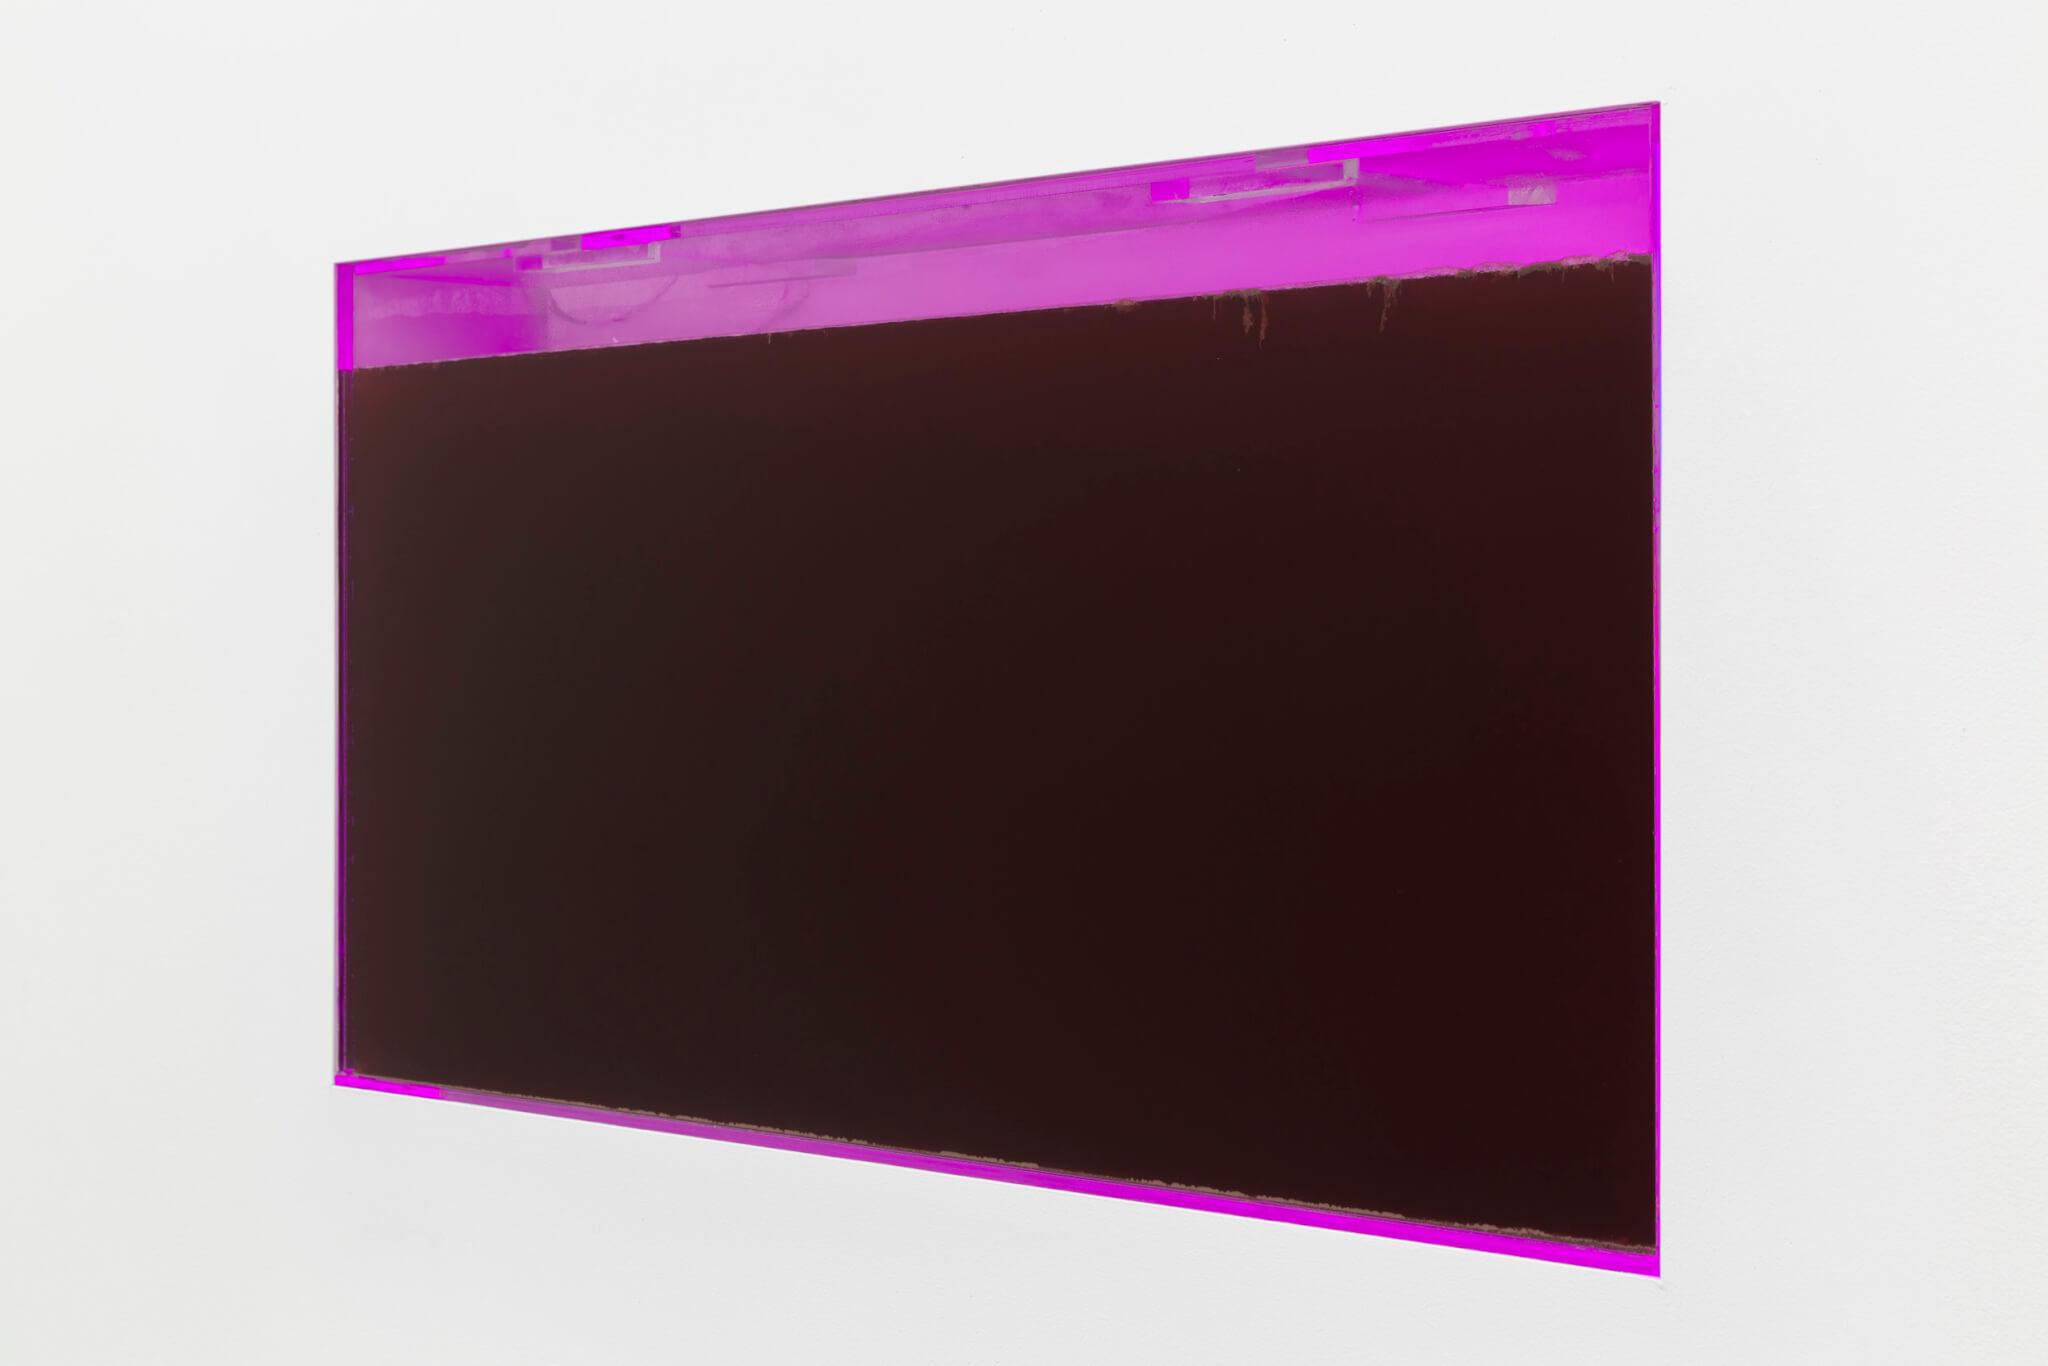 Lin, A Rose Window, 2019 (CL 19.029) A